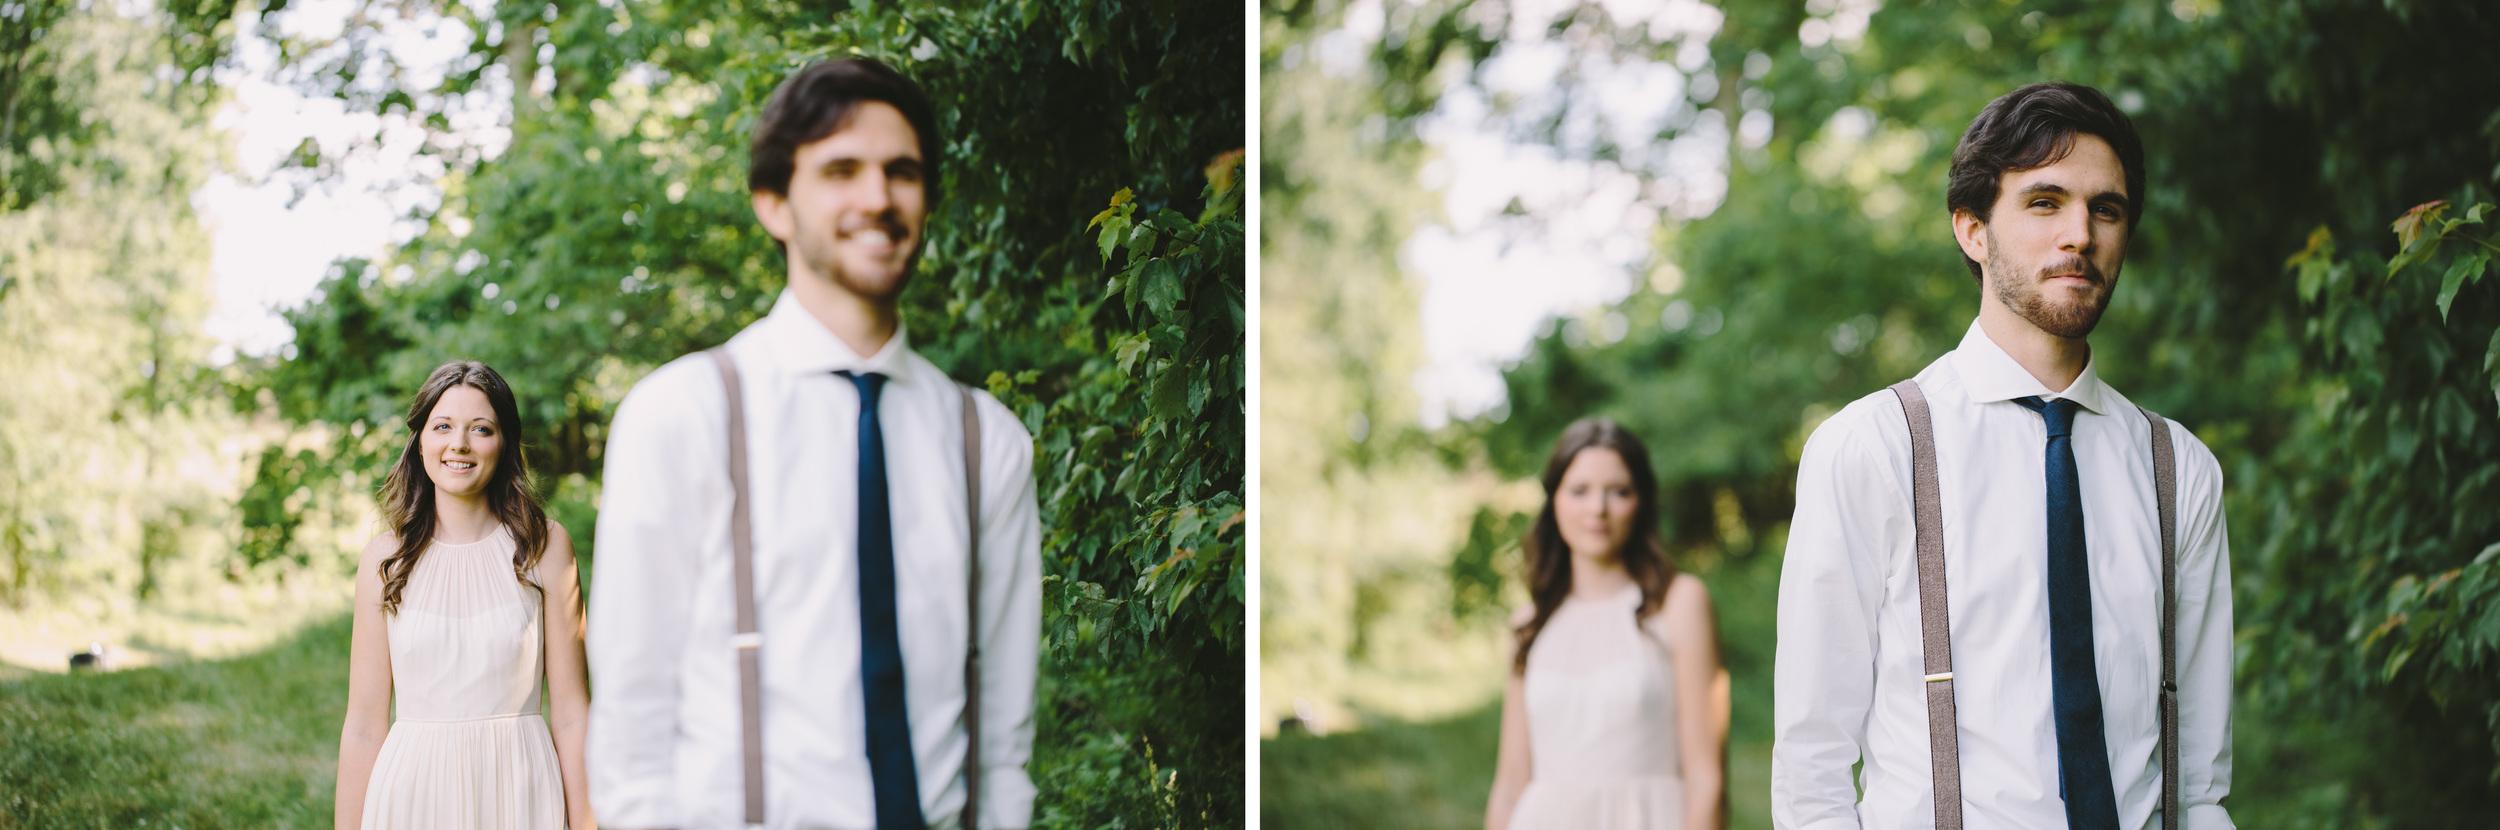 Zack + Hannah Millsaps Wedding in Greenville SC Nashville Wedding Photographer Photography Anthology-4 copy.jpg